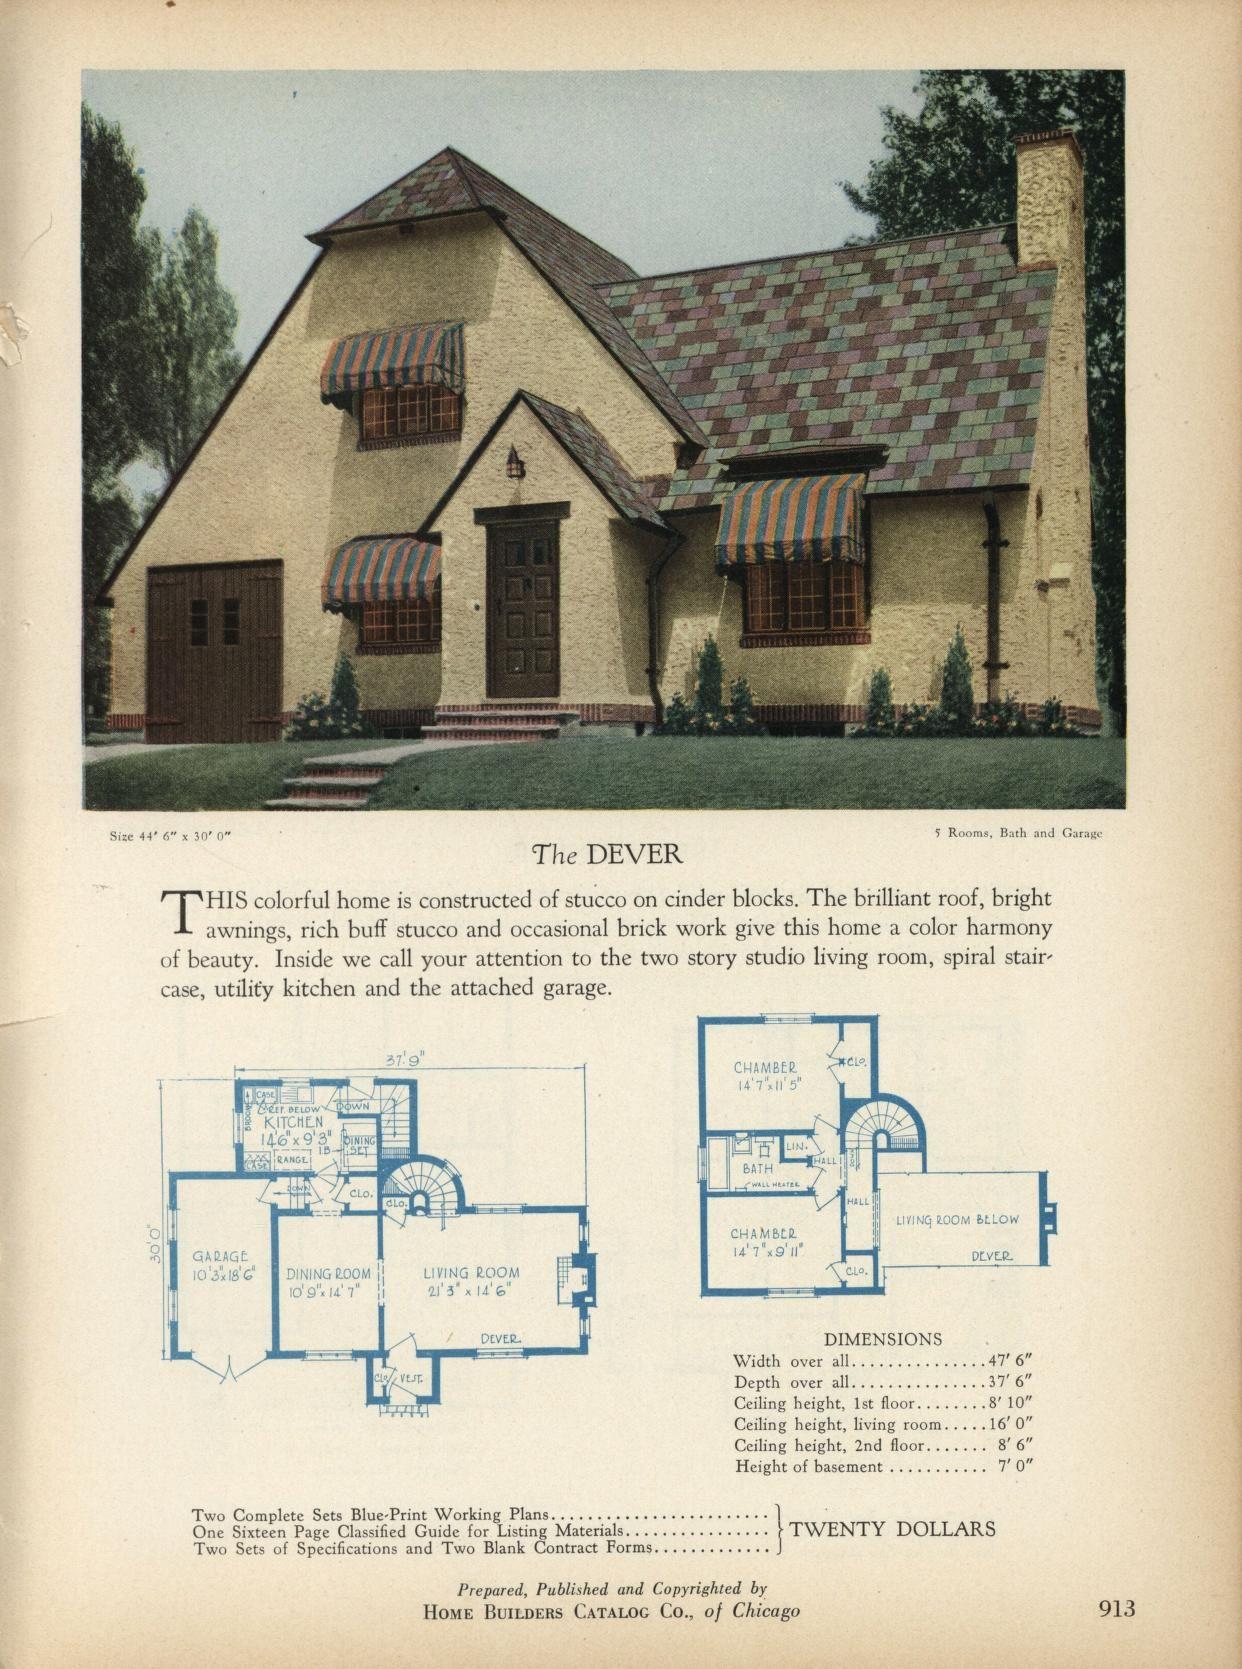 The Dever Home Builders Catalog Plans Of All Types Of Small Homes By Home Builders Catalog Co Published 1928 Vintage House Plans House Plans Architecture